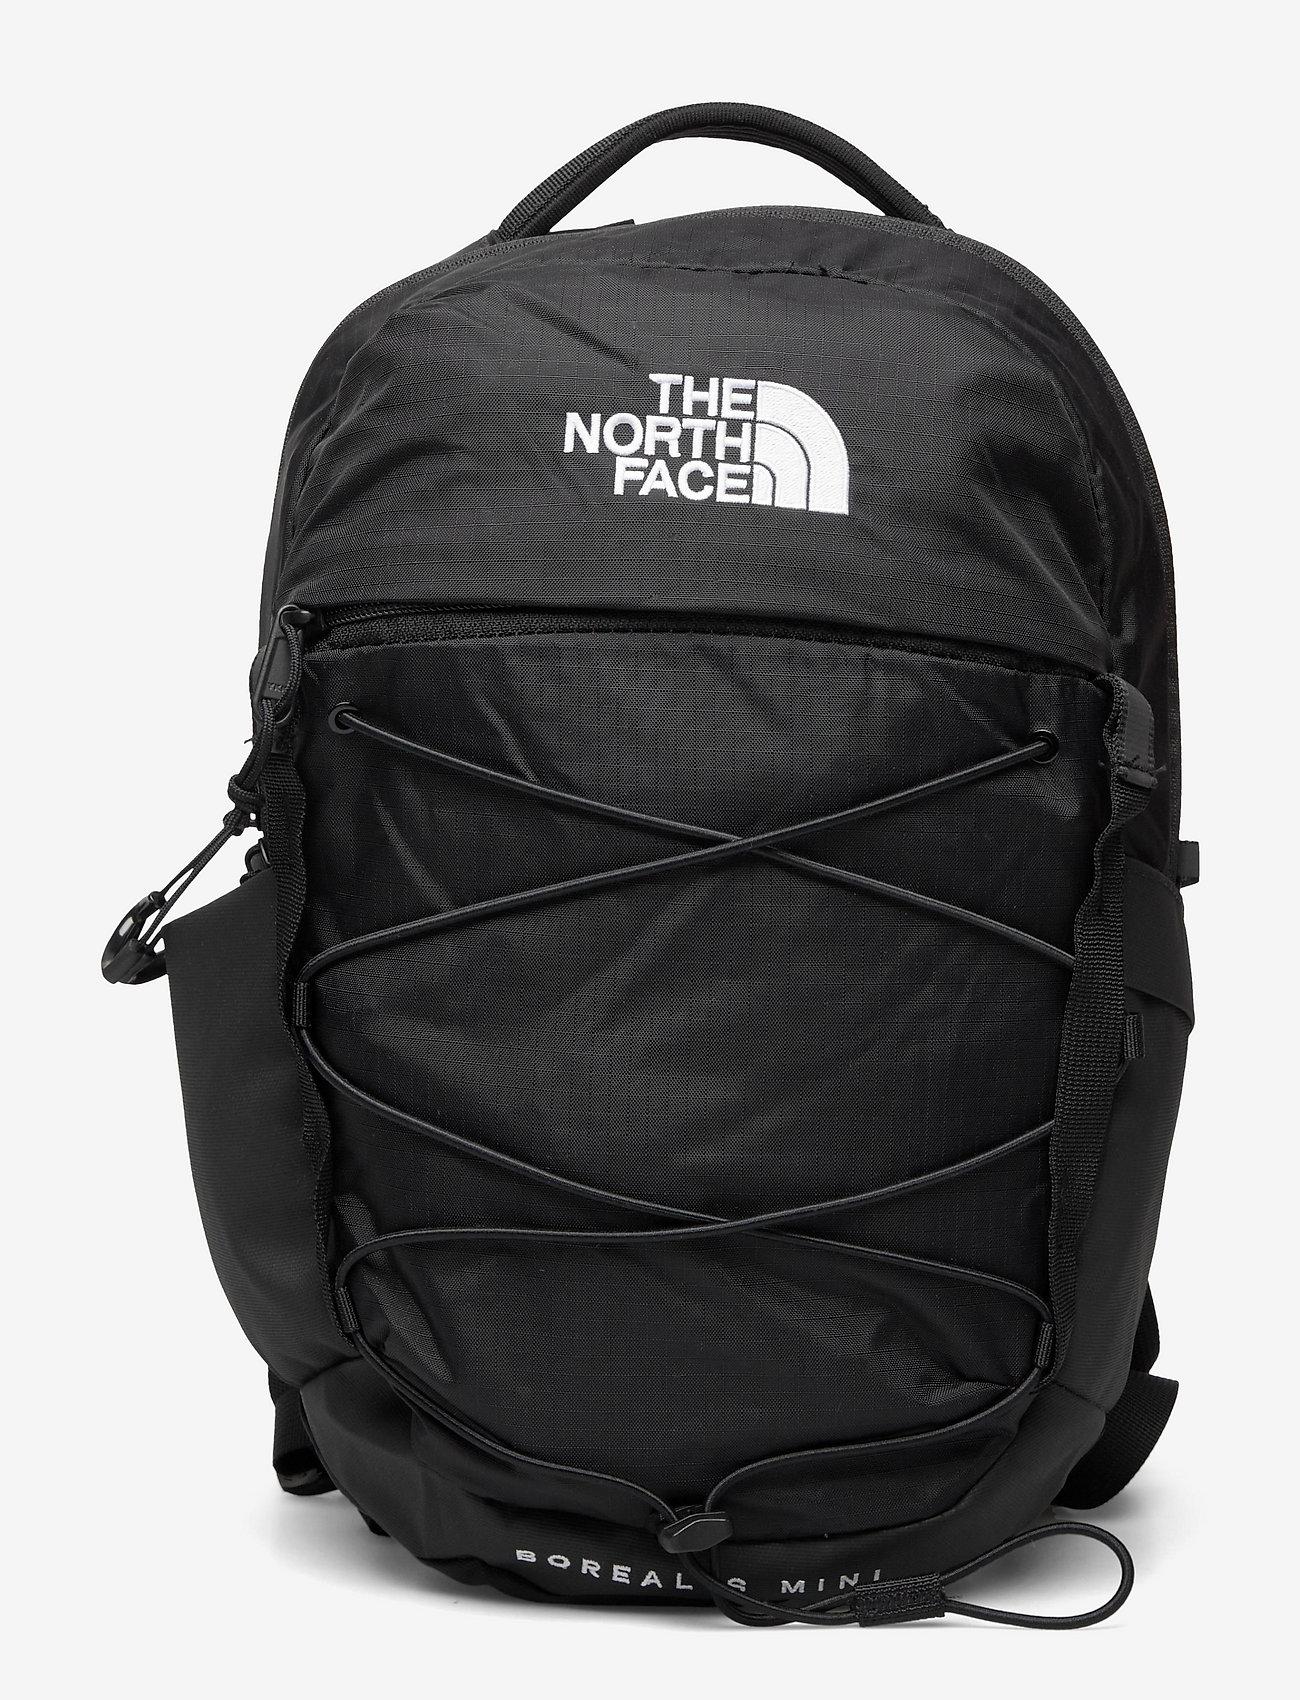 The North Face - BOREALIS MINI - sacs a dos - tnf black-tnf black - 0